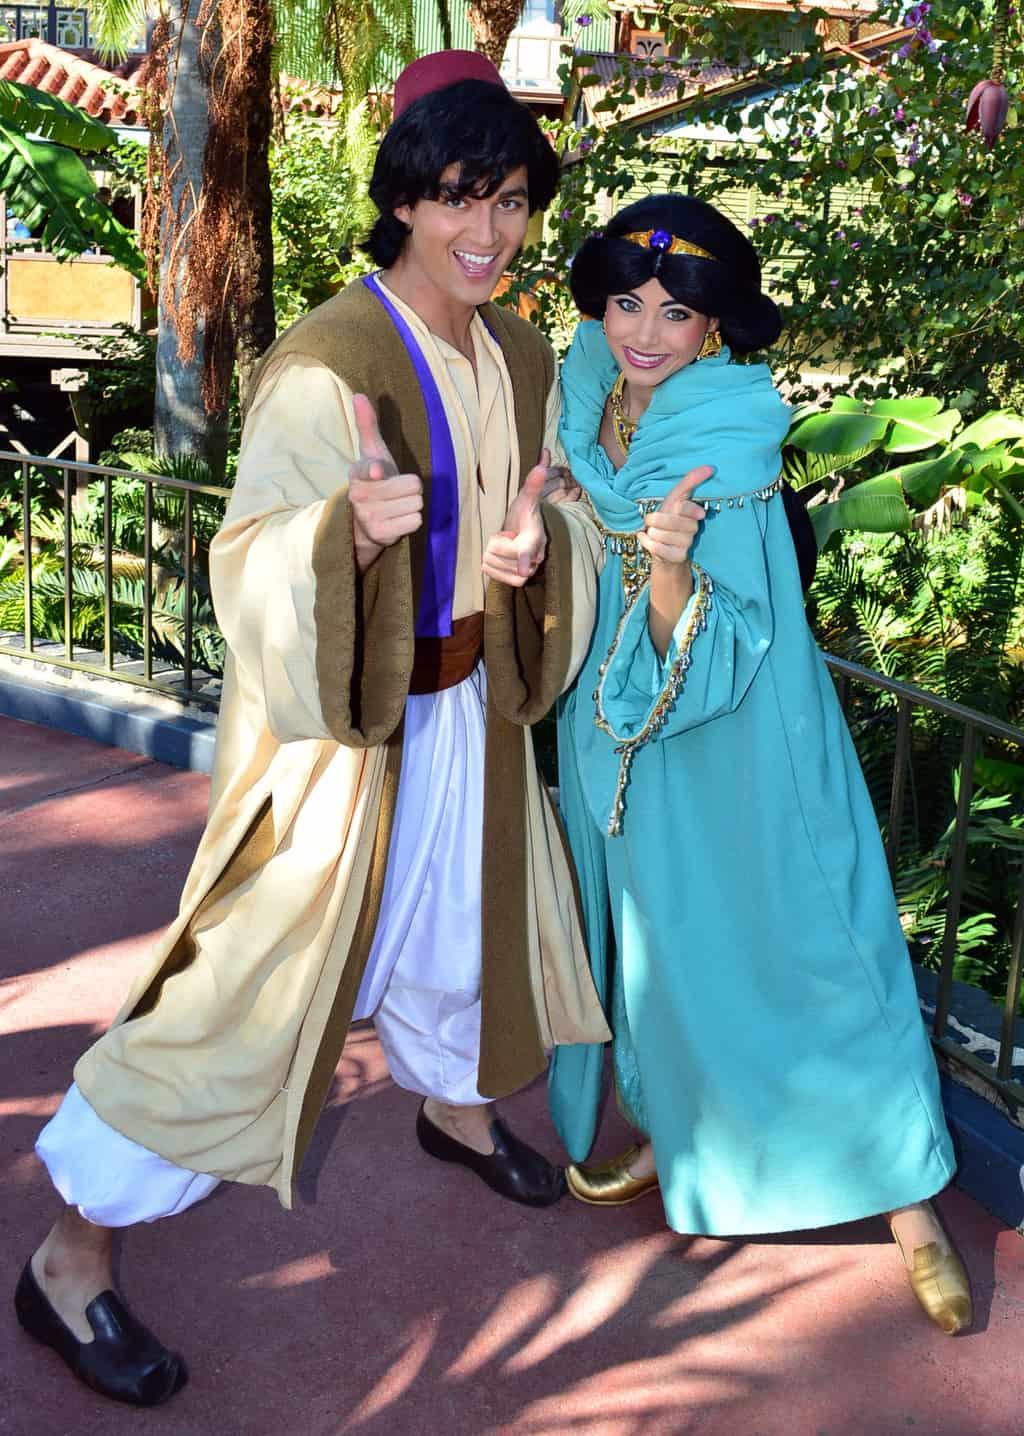 POLL Should Disney Bring Back Princess Jasmines Original